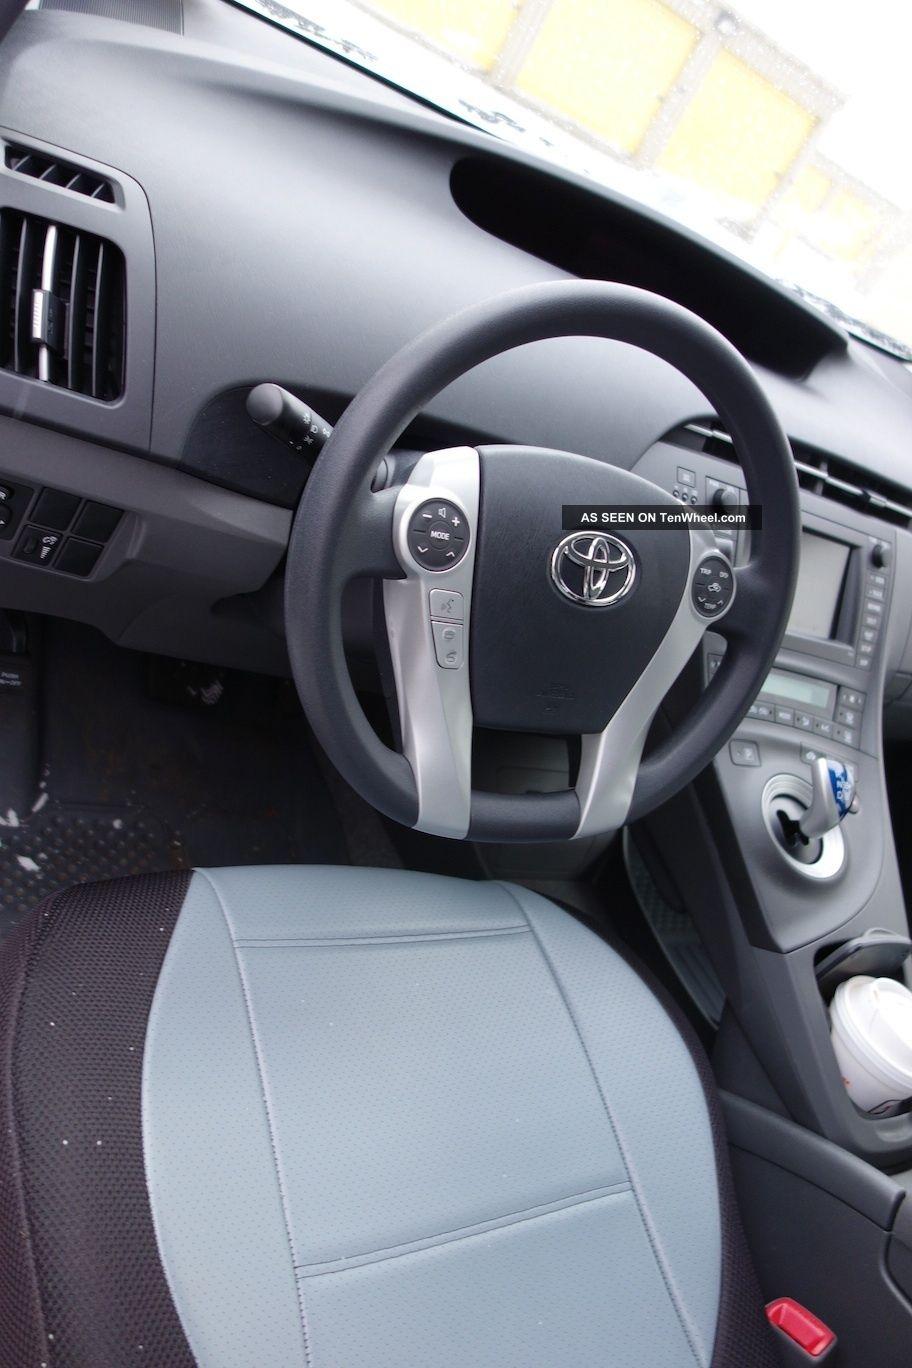 2011 Toyota Prius Model 3 With Gps Smartkey Backup